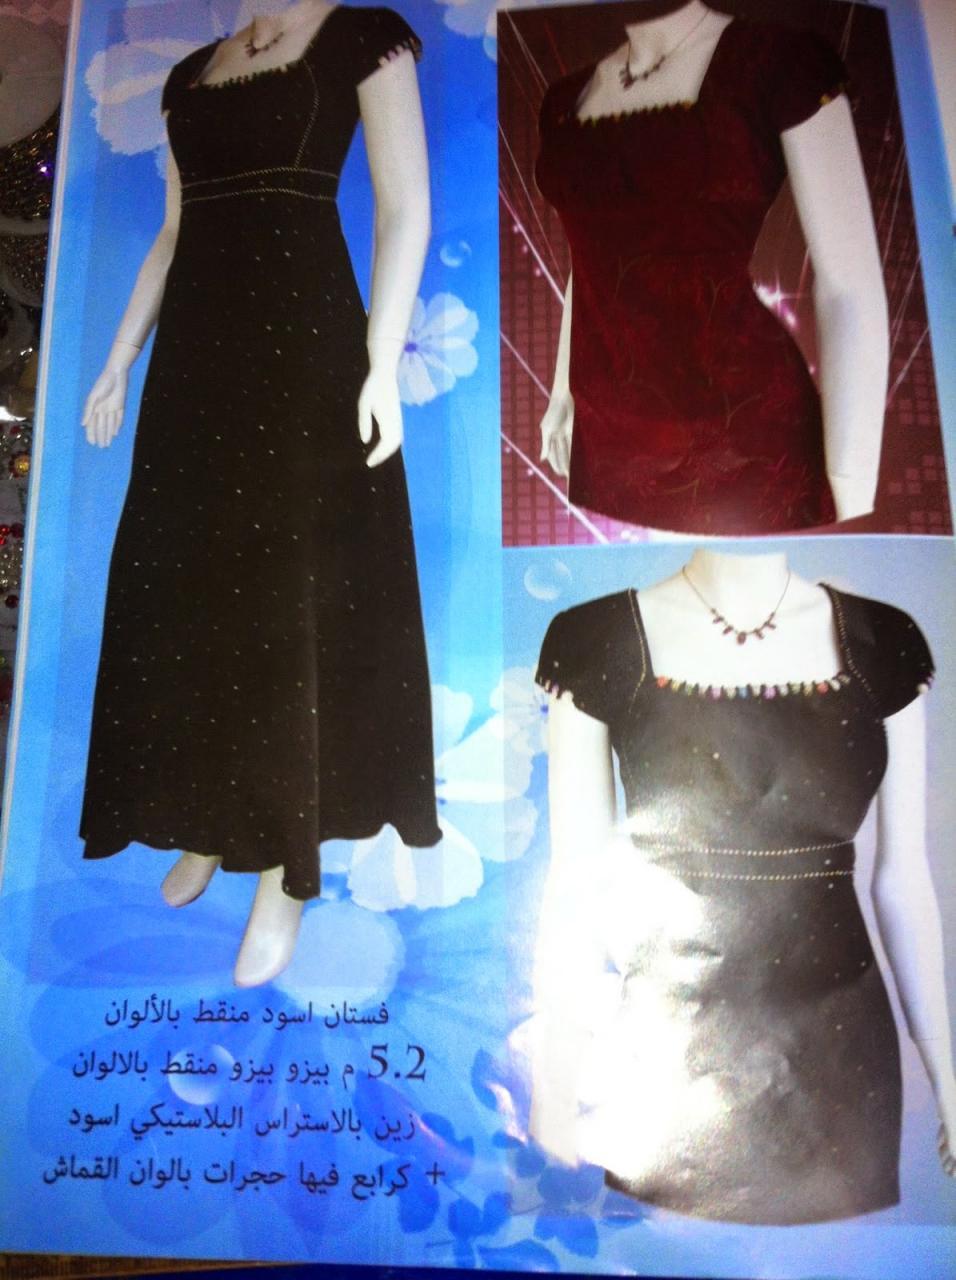 بالصور قنادر العيد 2019 خطوبة وسهرات 20160716 1383